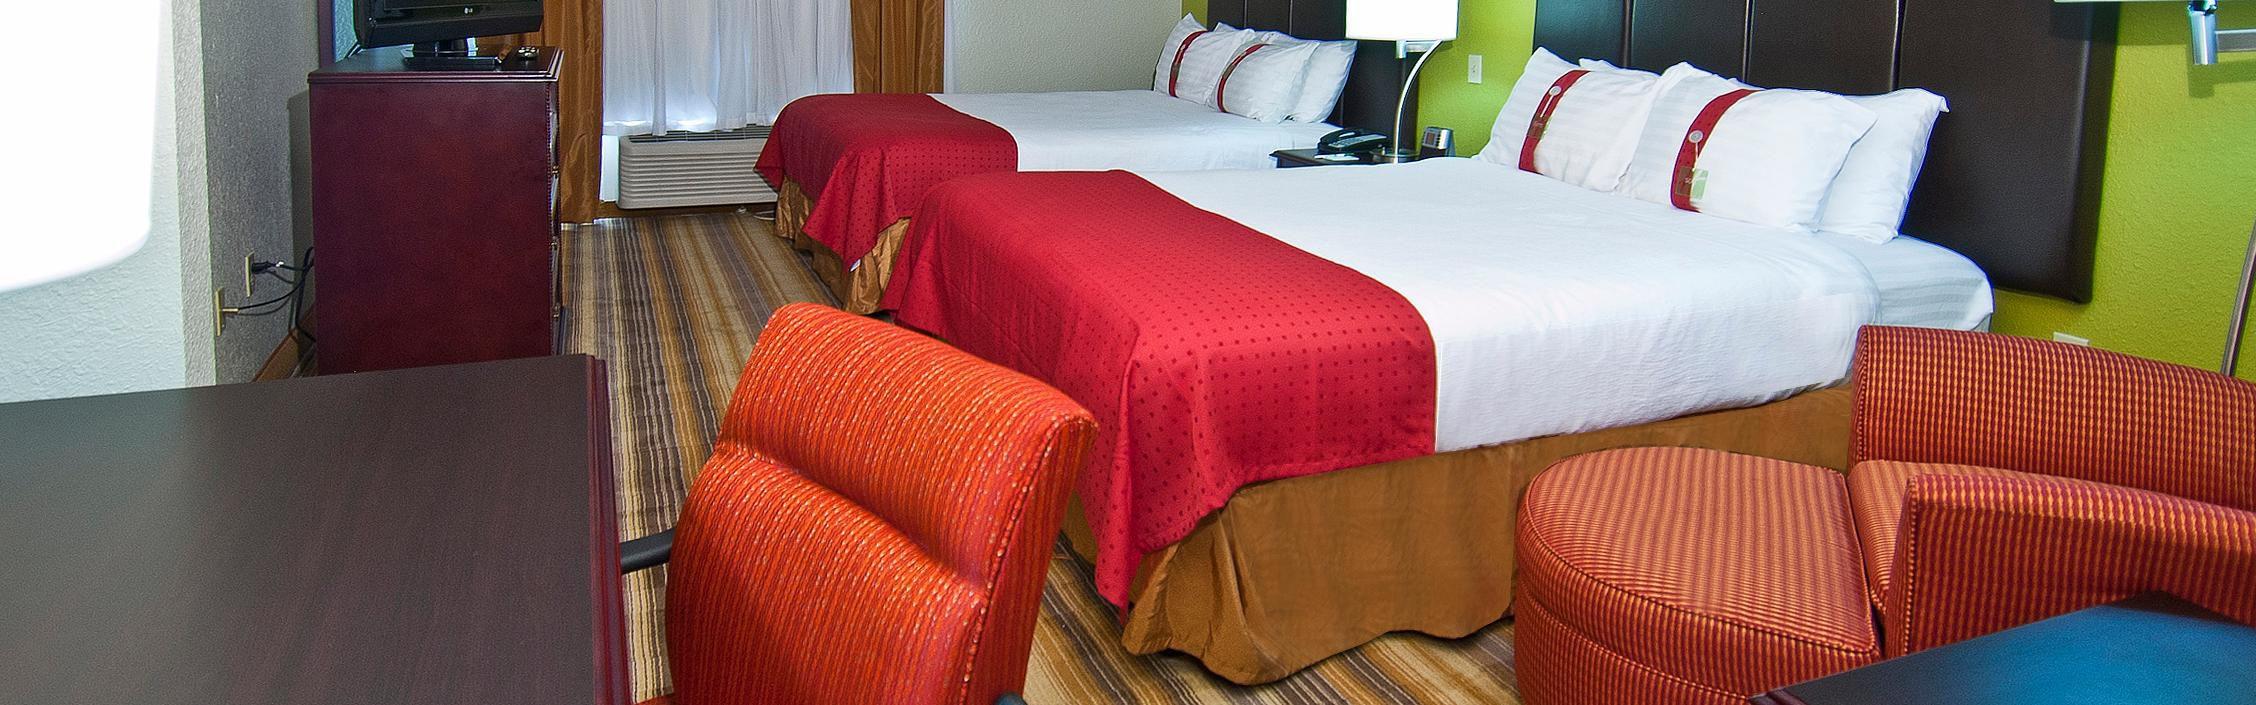 holiday inn vicksburg hotel by ihg rh ihg com holiday inn vicksburg ms reviews holiday inn vicksburg ms review